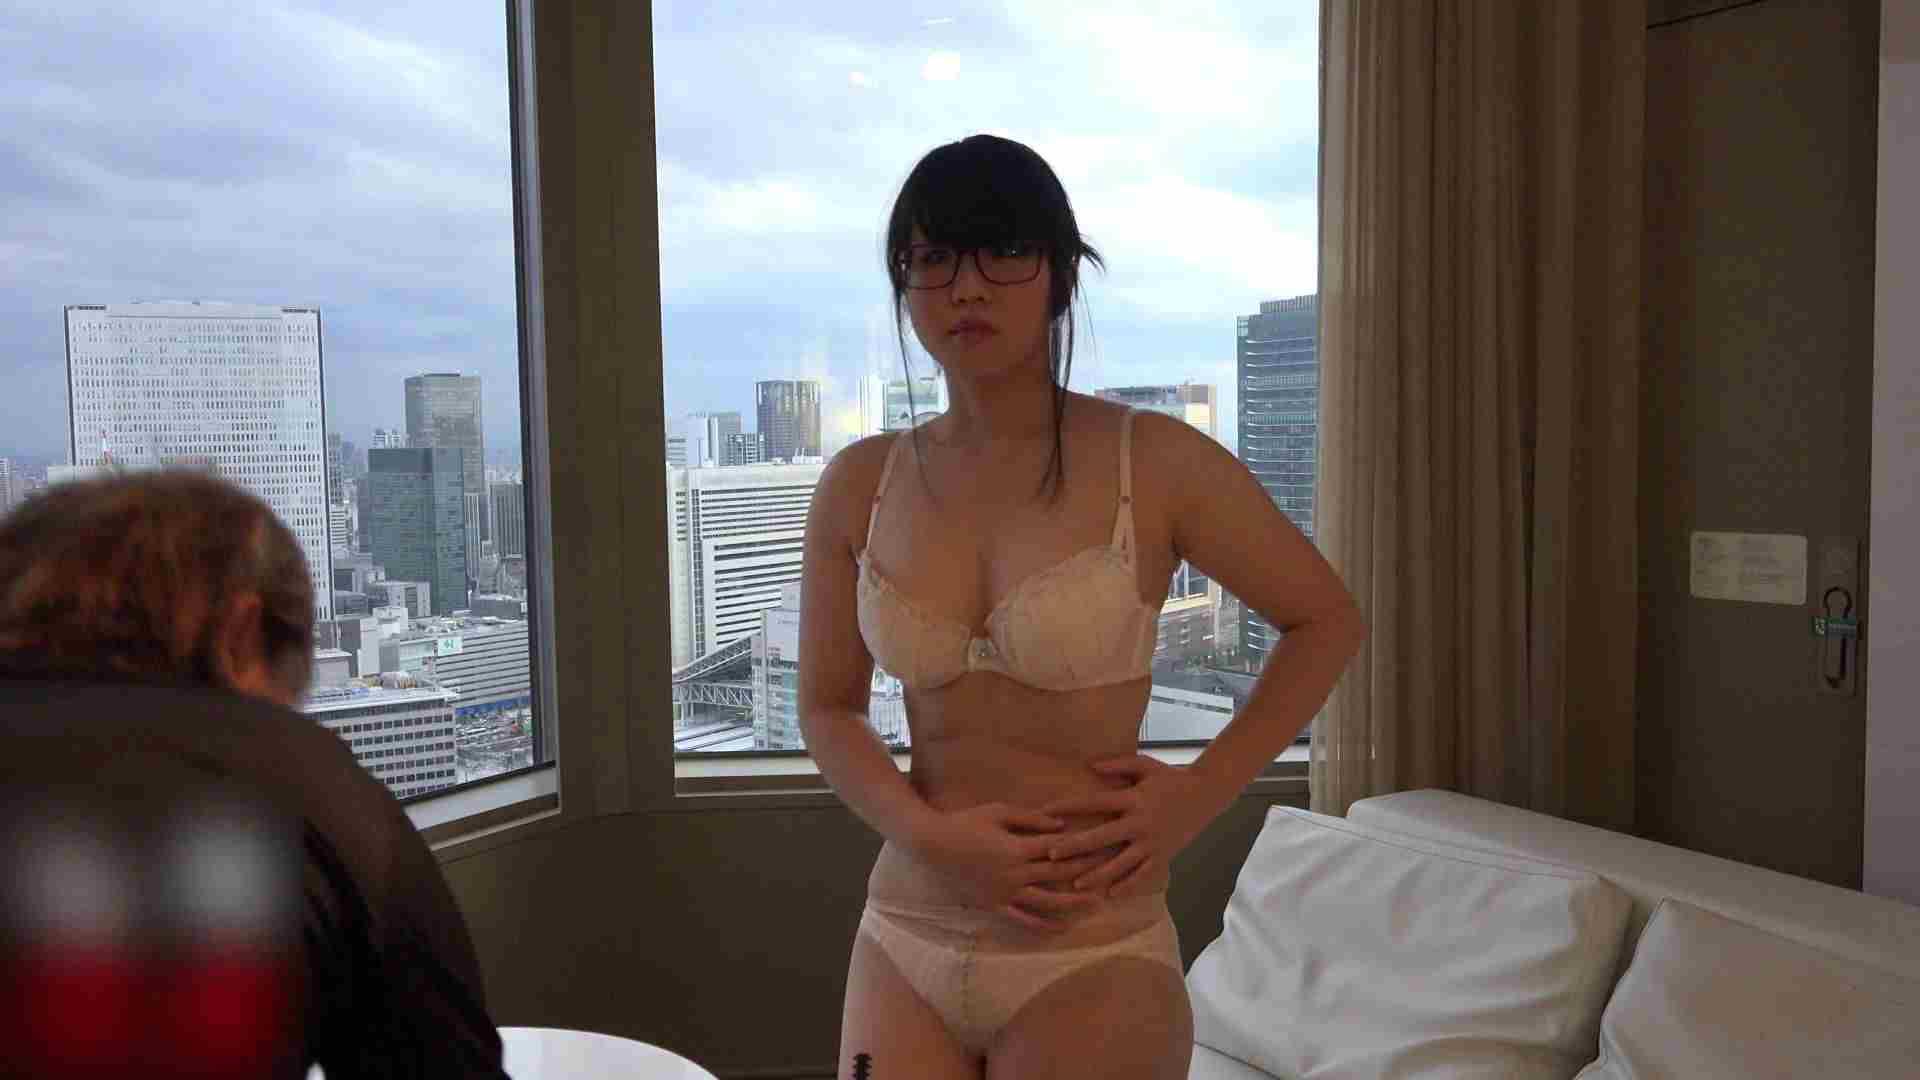 S級厳選美女ビッチガールVol.39 前編 0 | 0  112画像 67